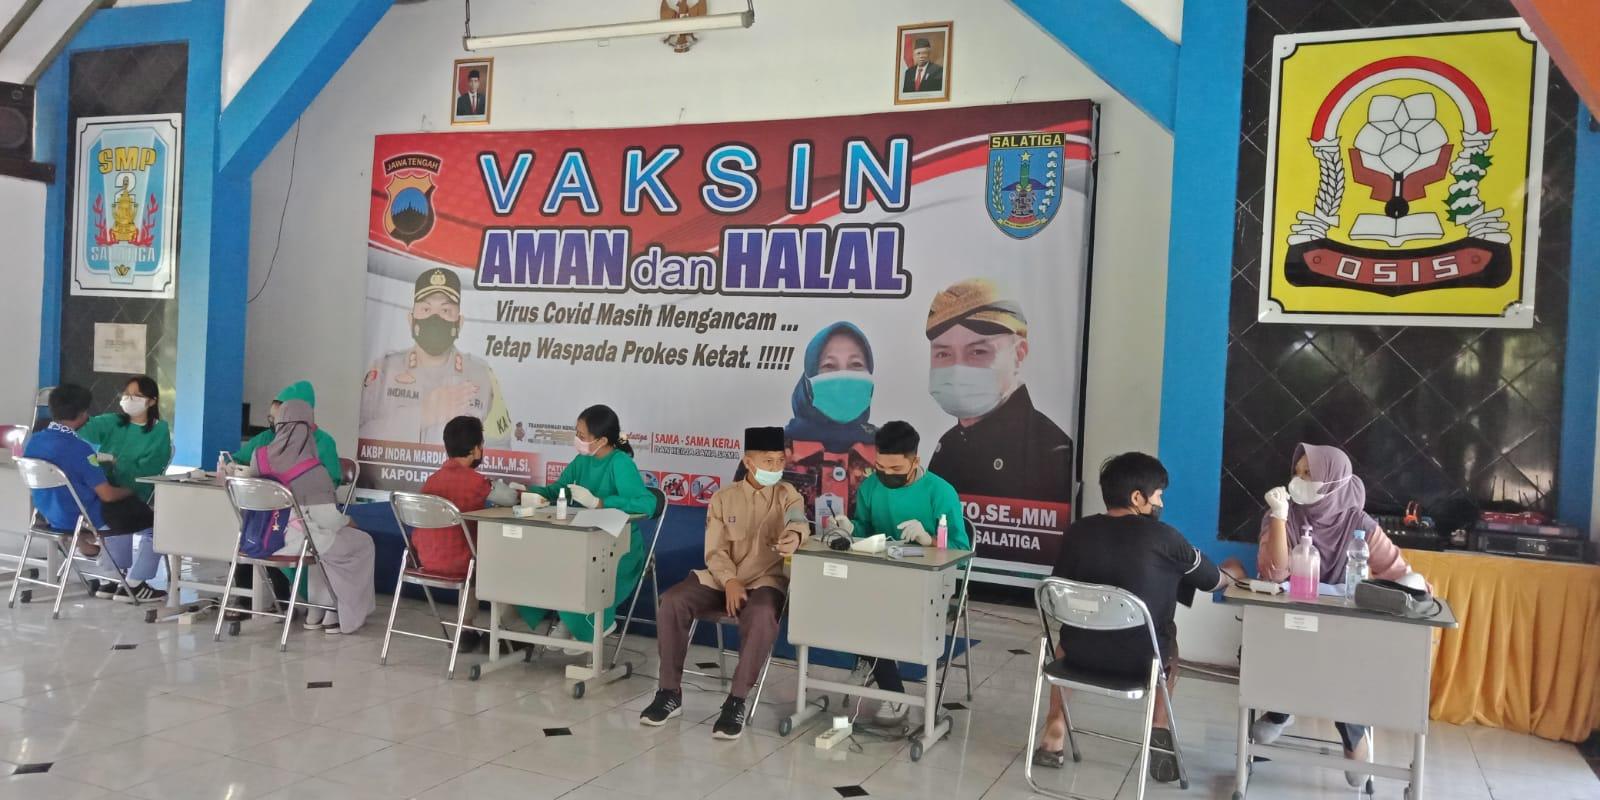 Polres Kota Salatiga Bekerja Sama dengan Dinas Pendidikan Kota Salatiga dan SMP Negeri 2 Salatiga Laksanakan Vaksin 1